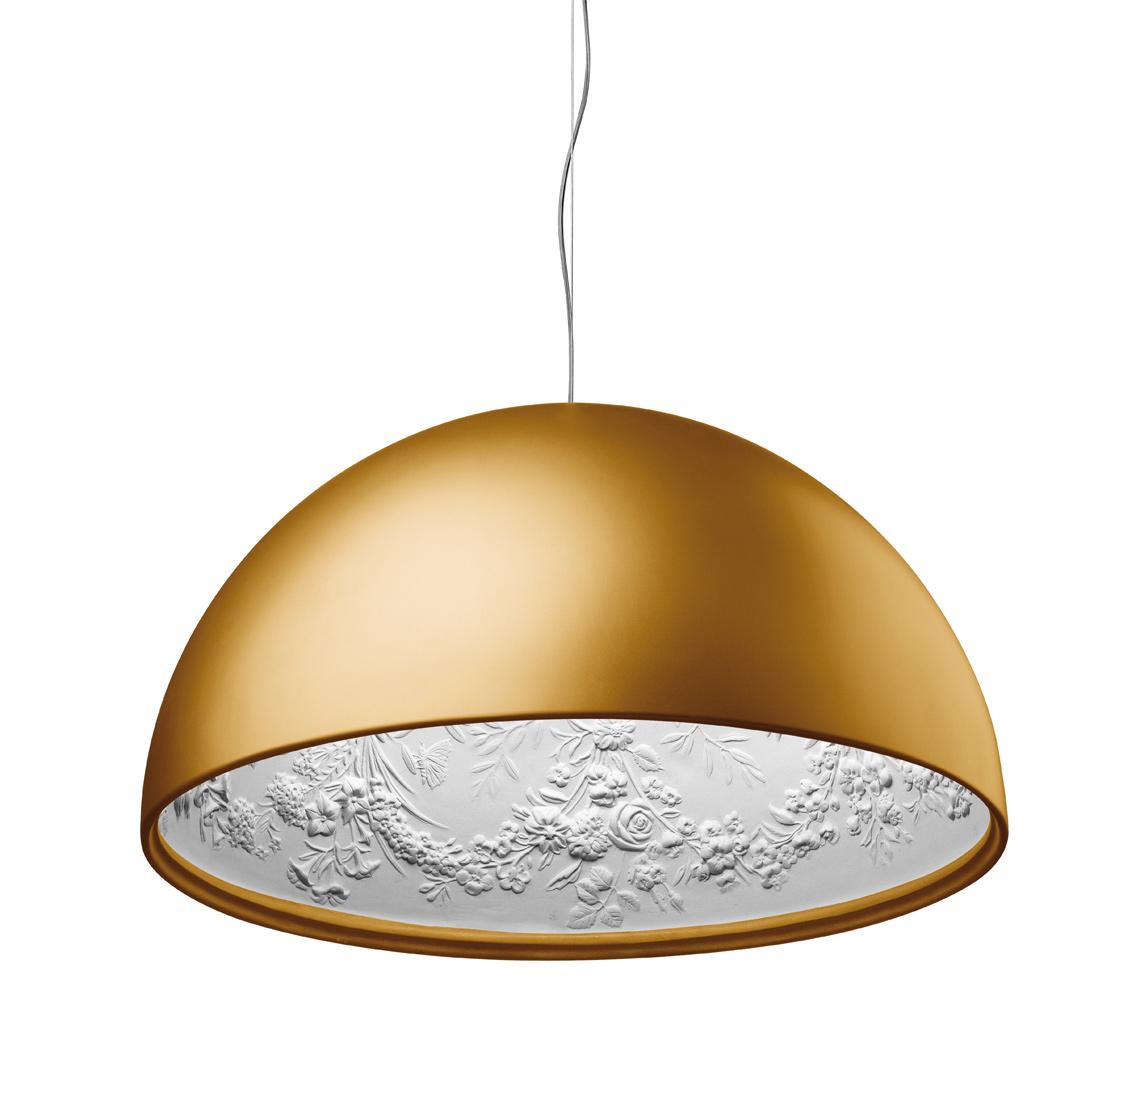 Flos-Skygarden-2-gold-Pendellampe-Design-Marcel-Wanders-Designhoming-com.FLO247a